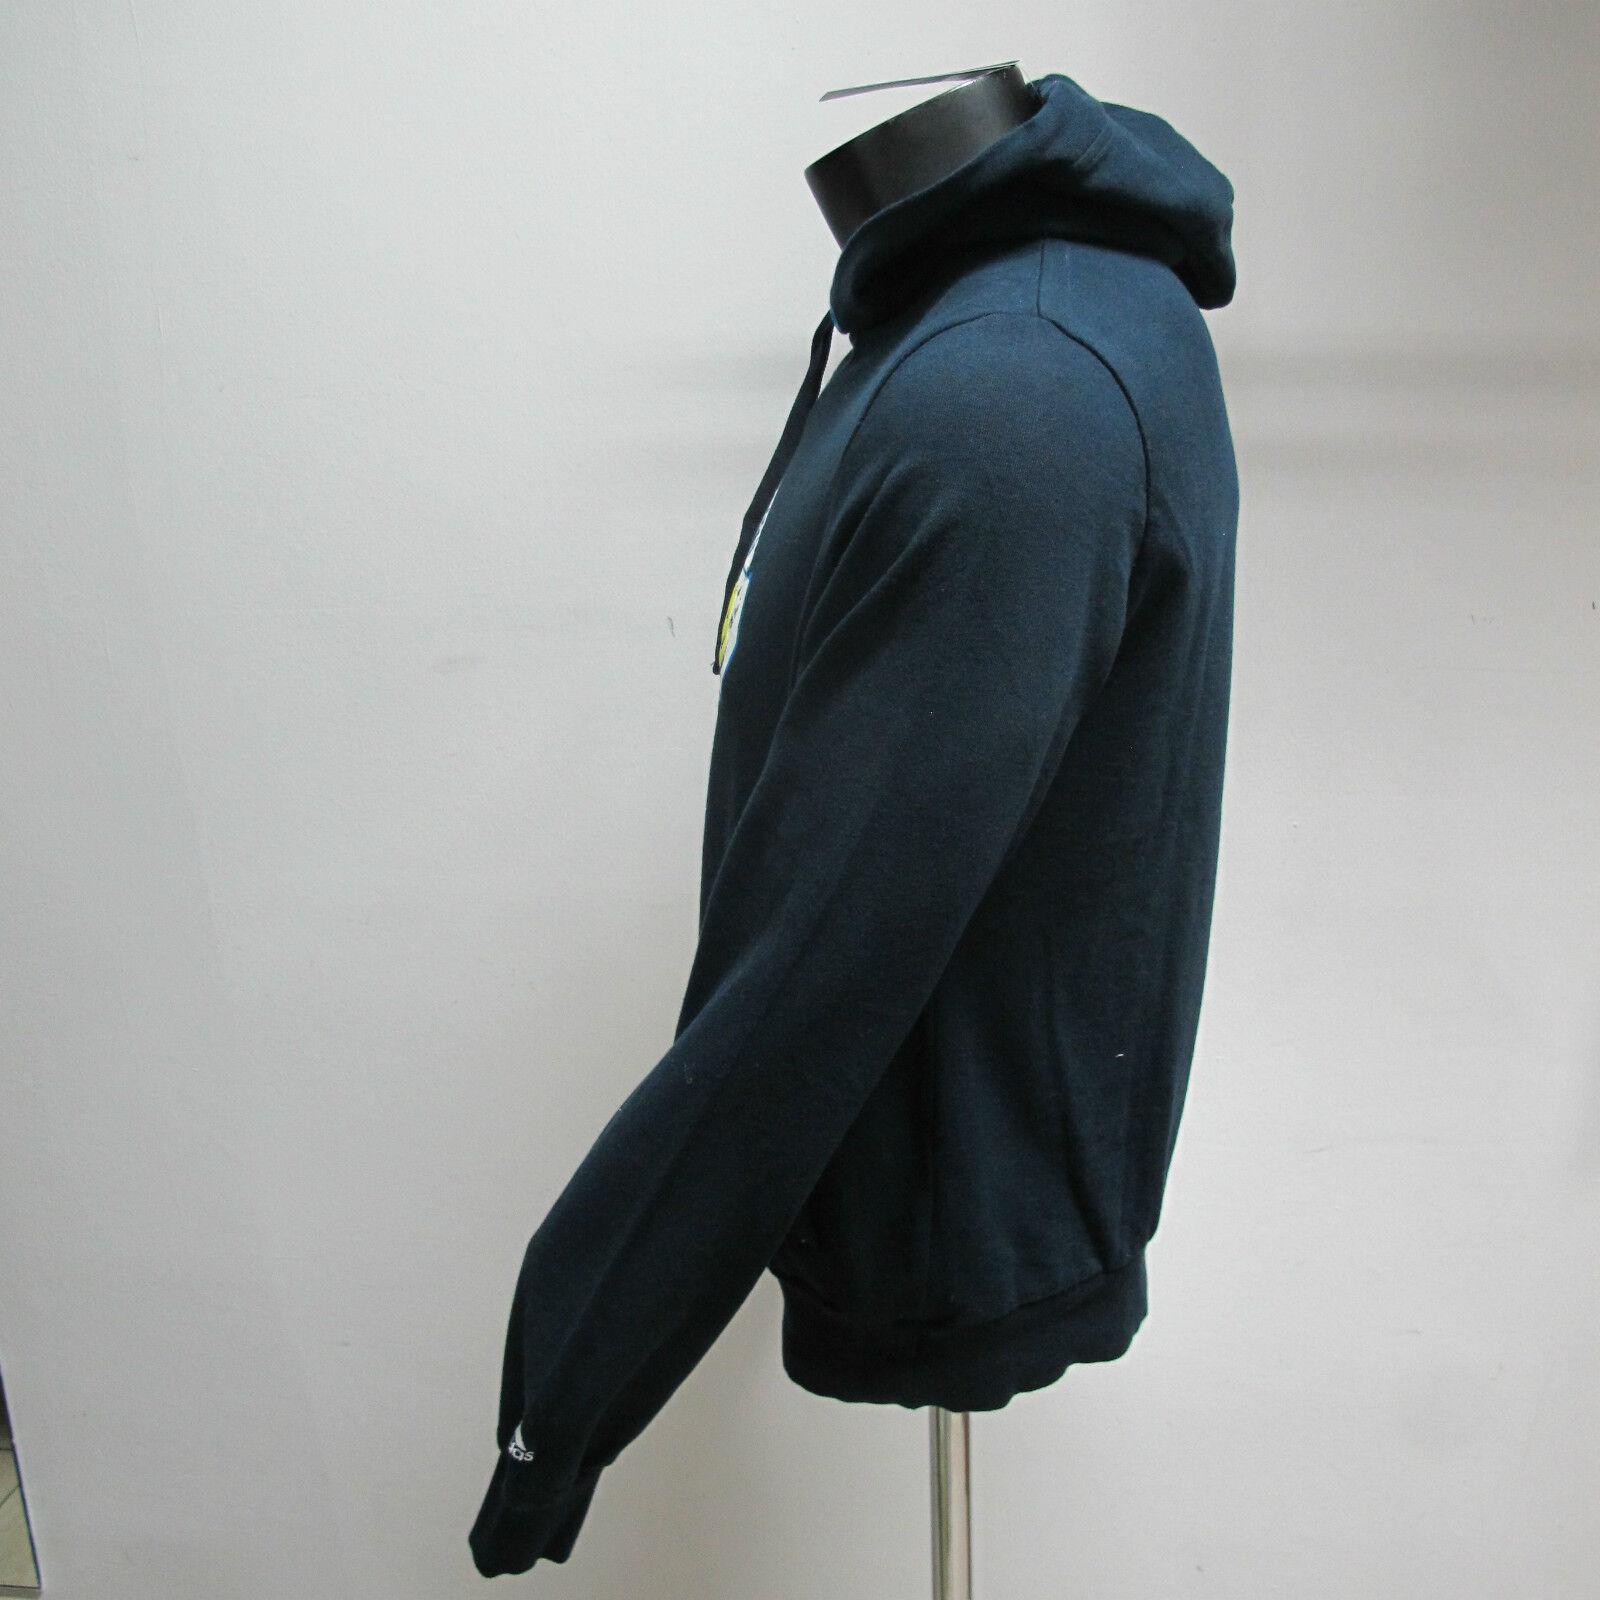 ADIDAS Herren-Sweatshirt mit Blau Kapuze mod.SUMMER FAV GR Farbe Blau mit tg.4 Sommer 9041b6